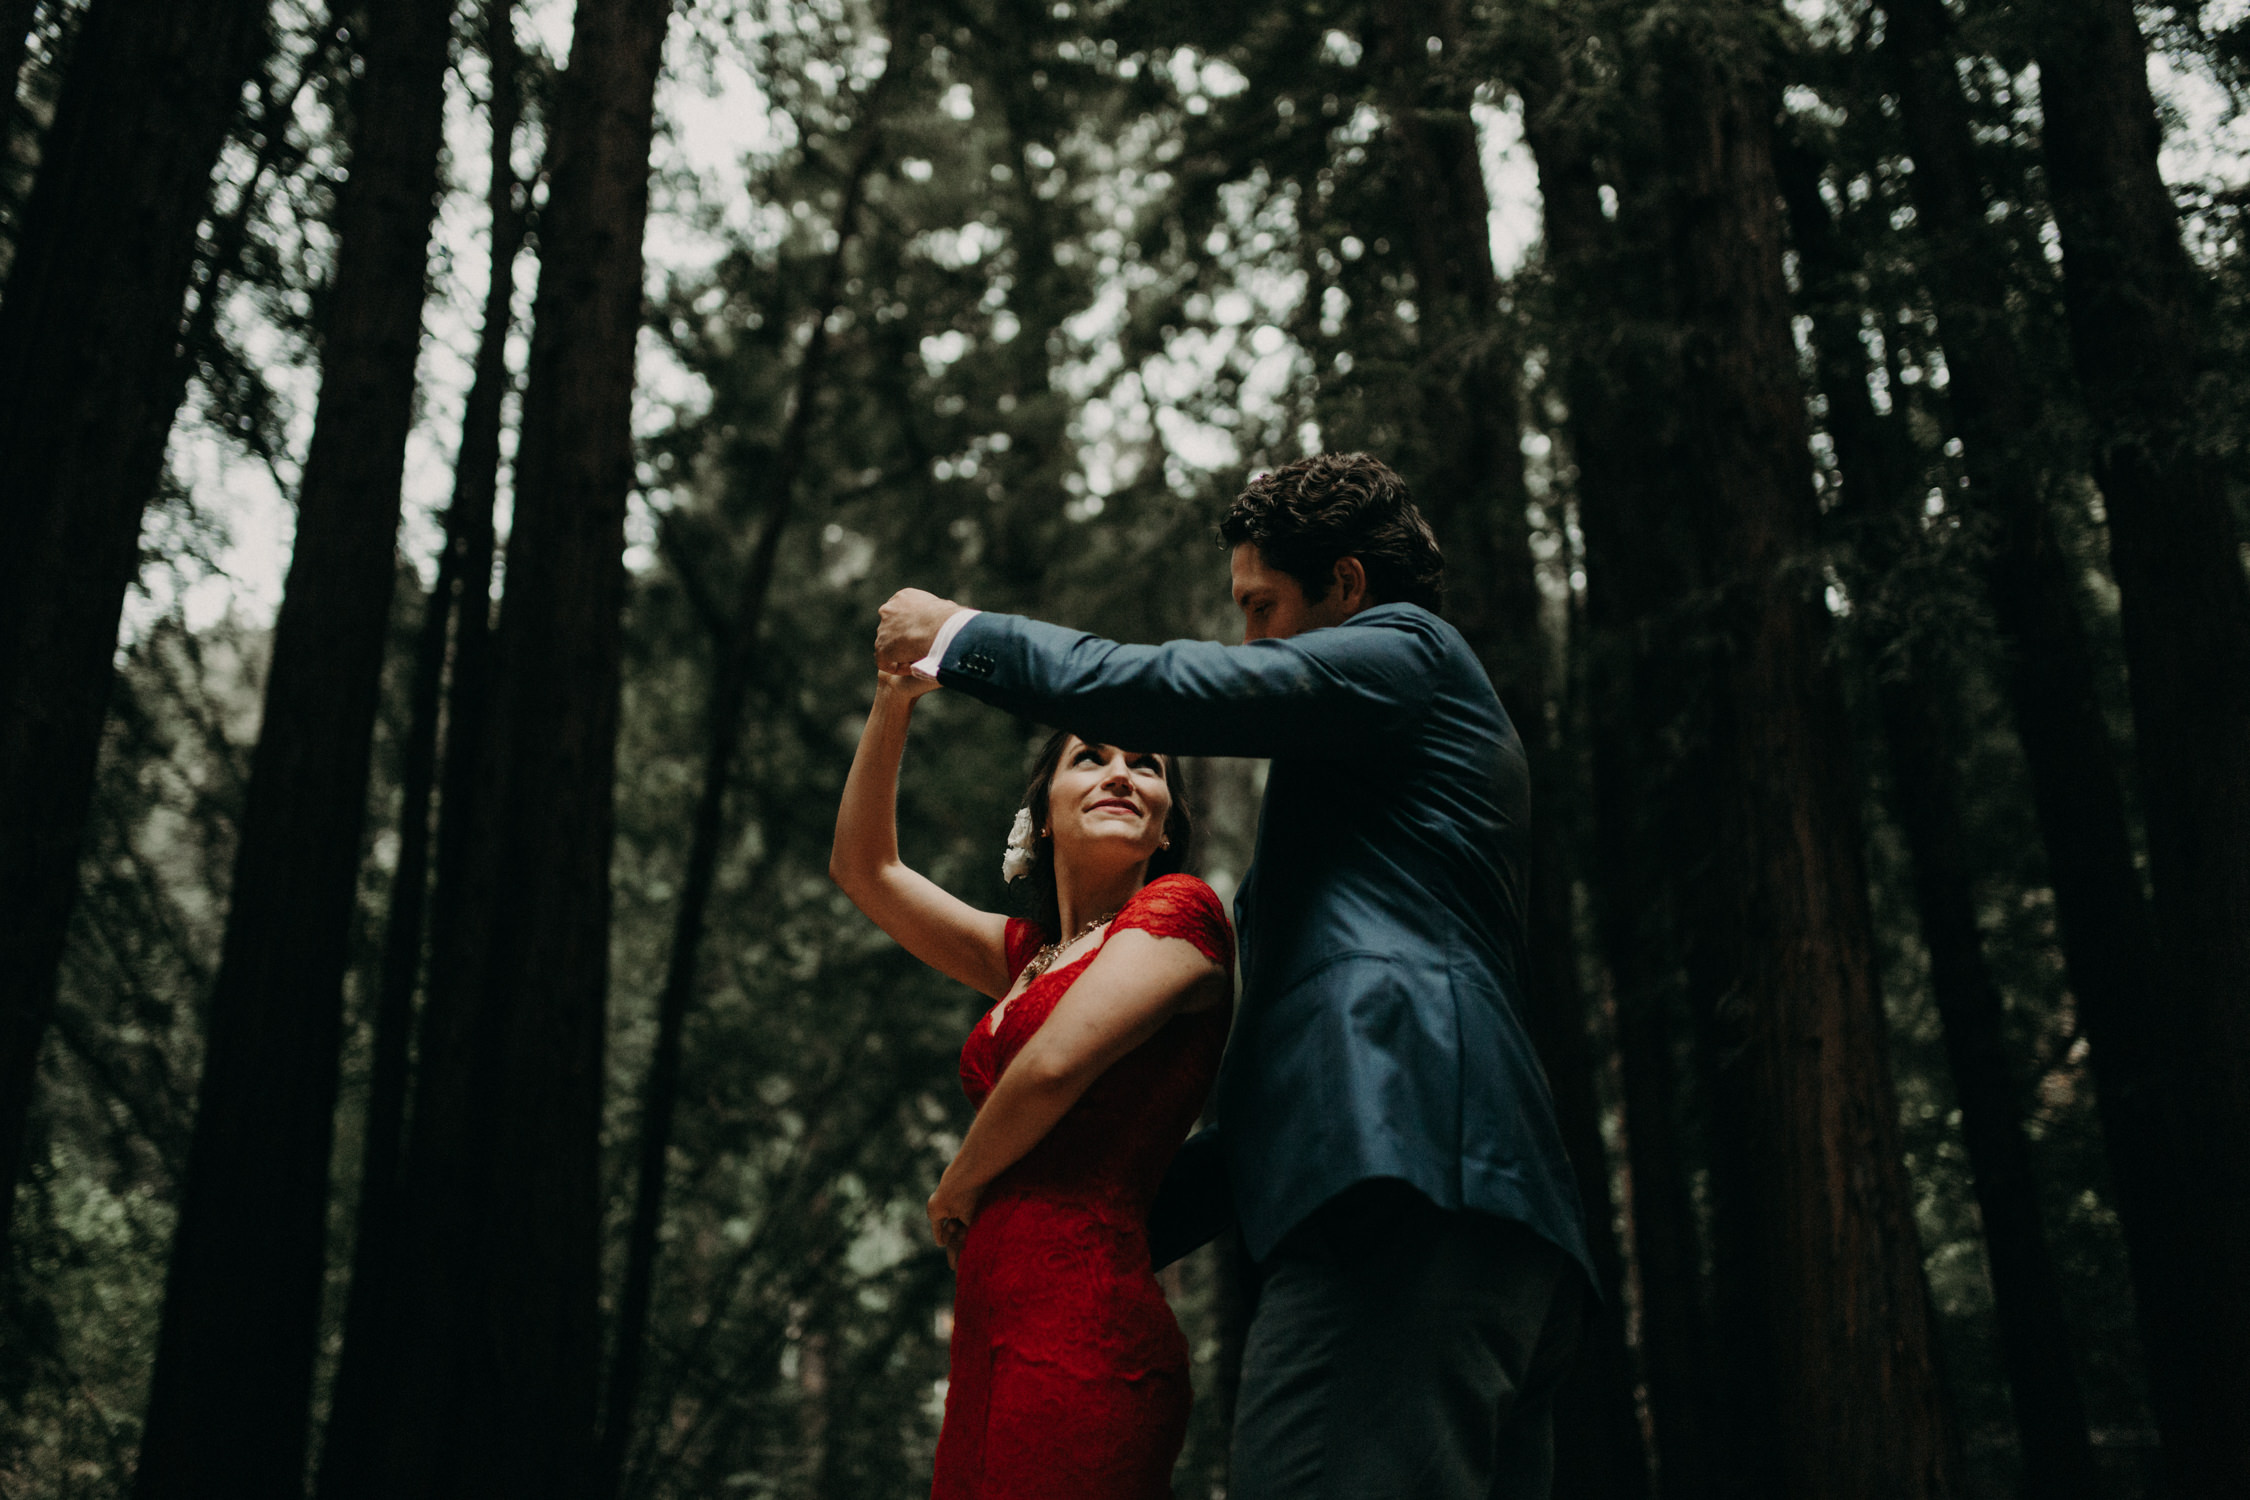 couple-intimate-engagement-session-mt-tam-63.jpg